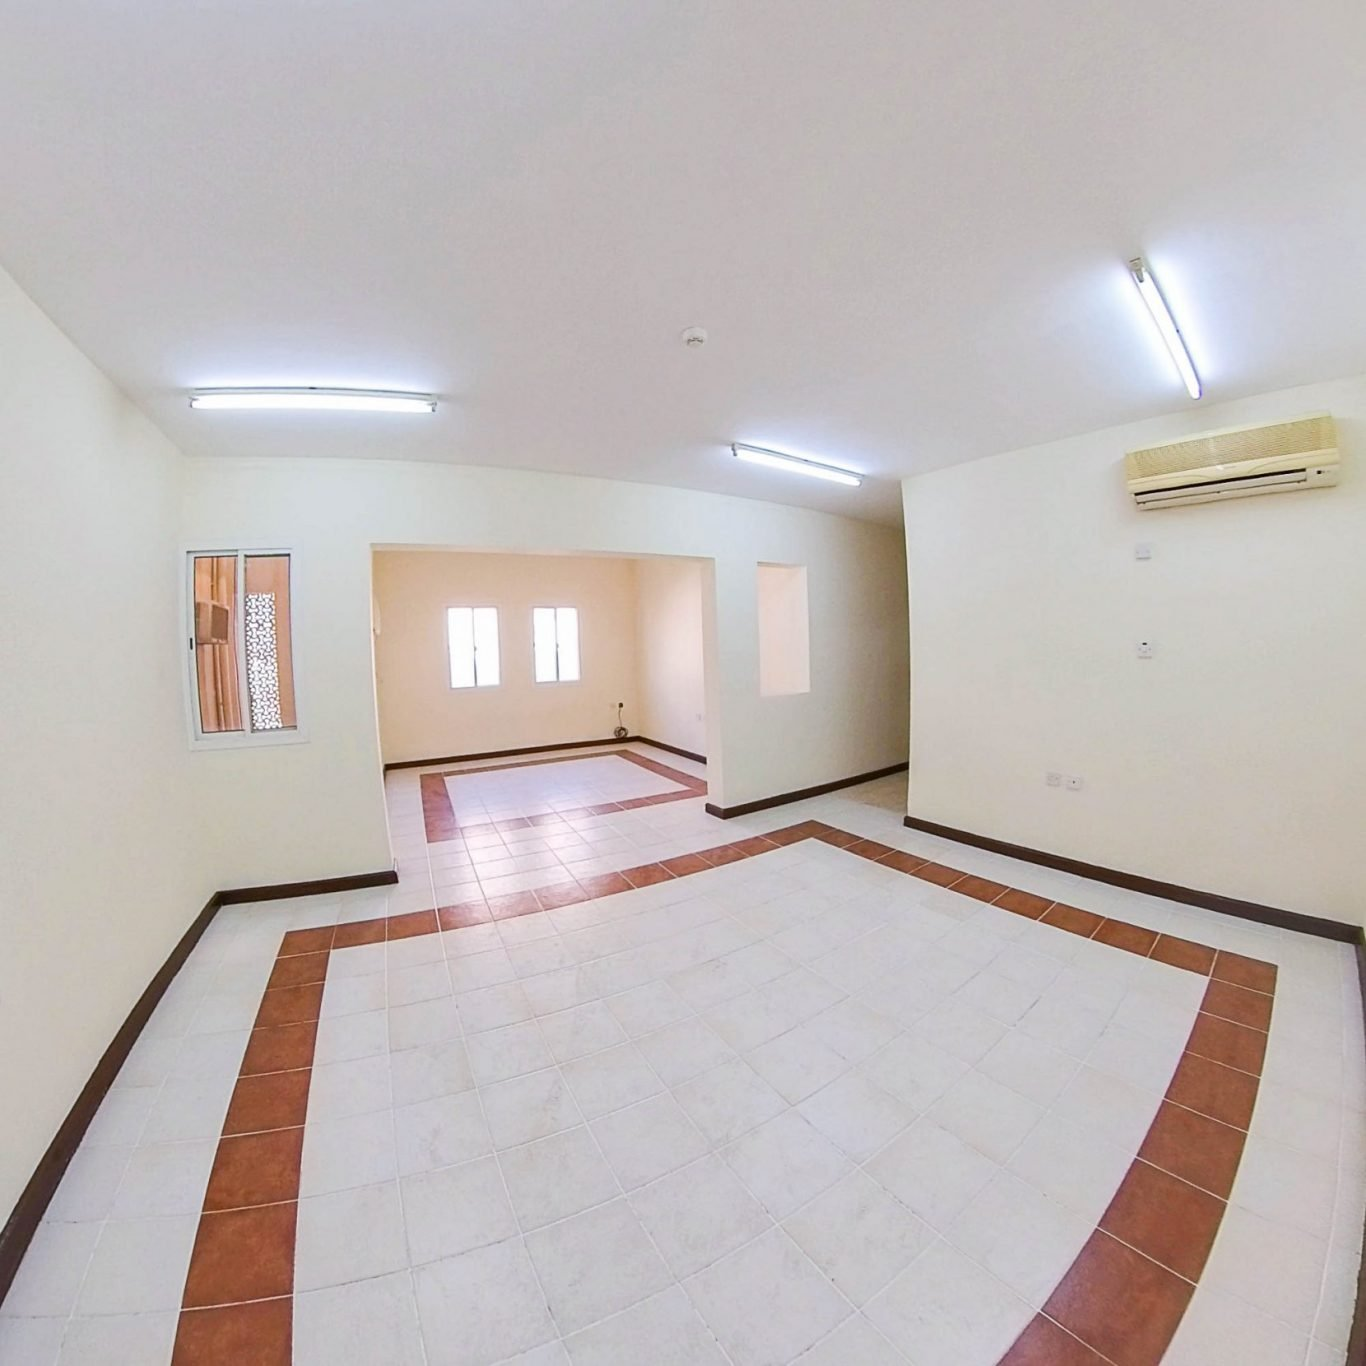 Unfurnished, 2 BHK Apartment in Fereej Abdel Aziz